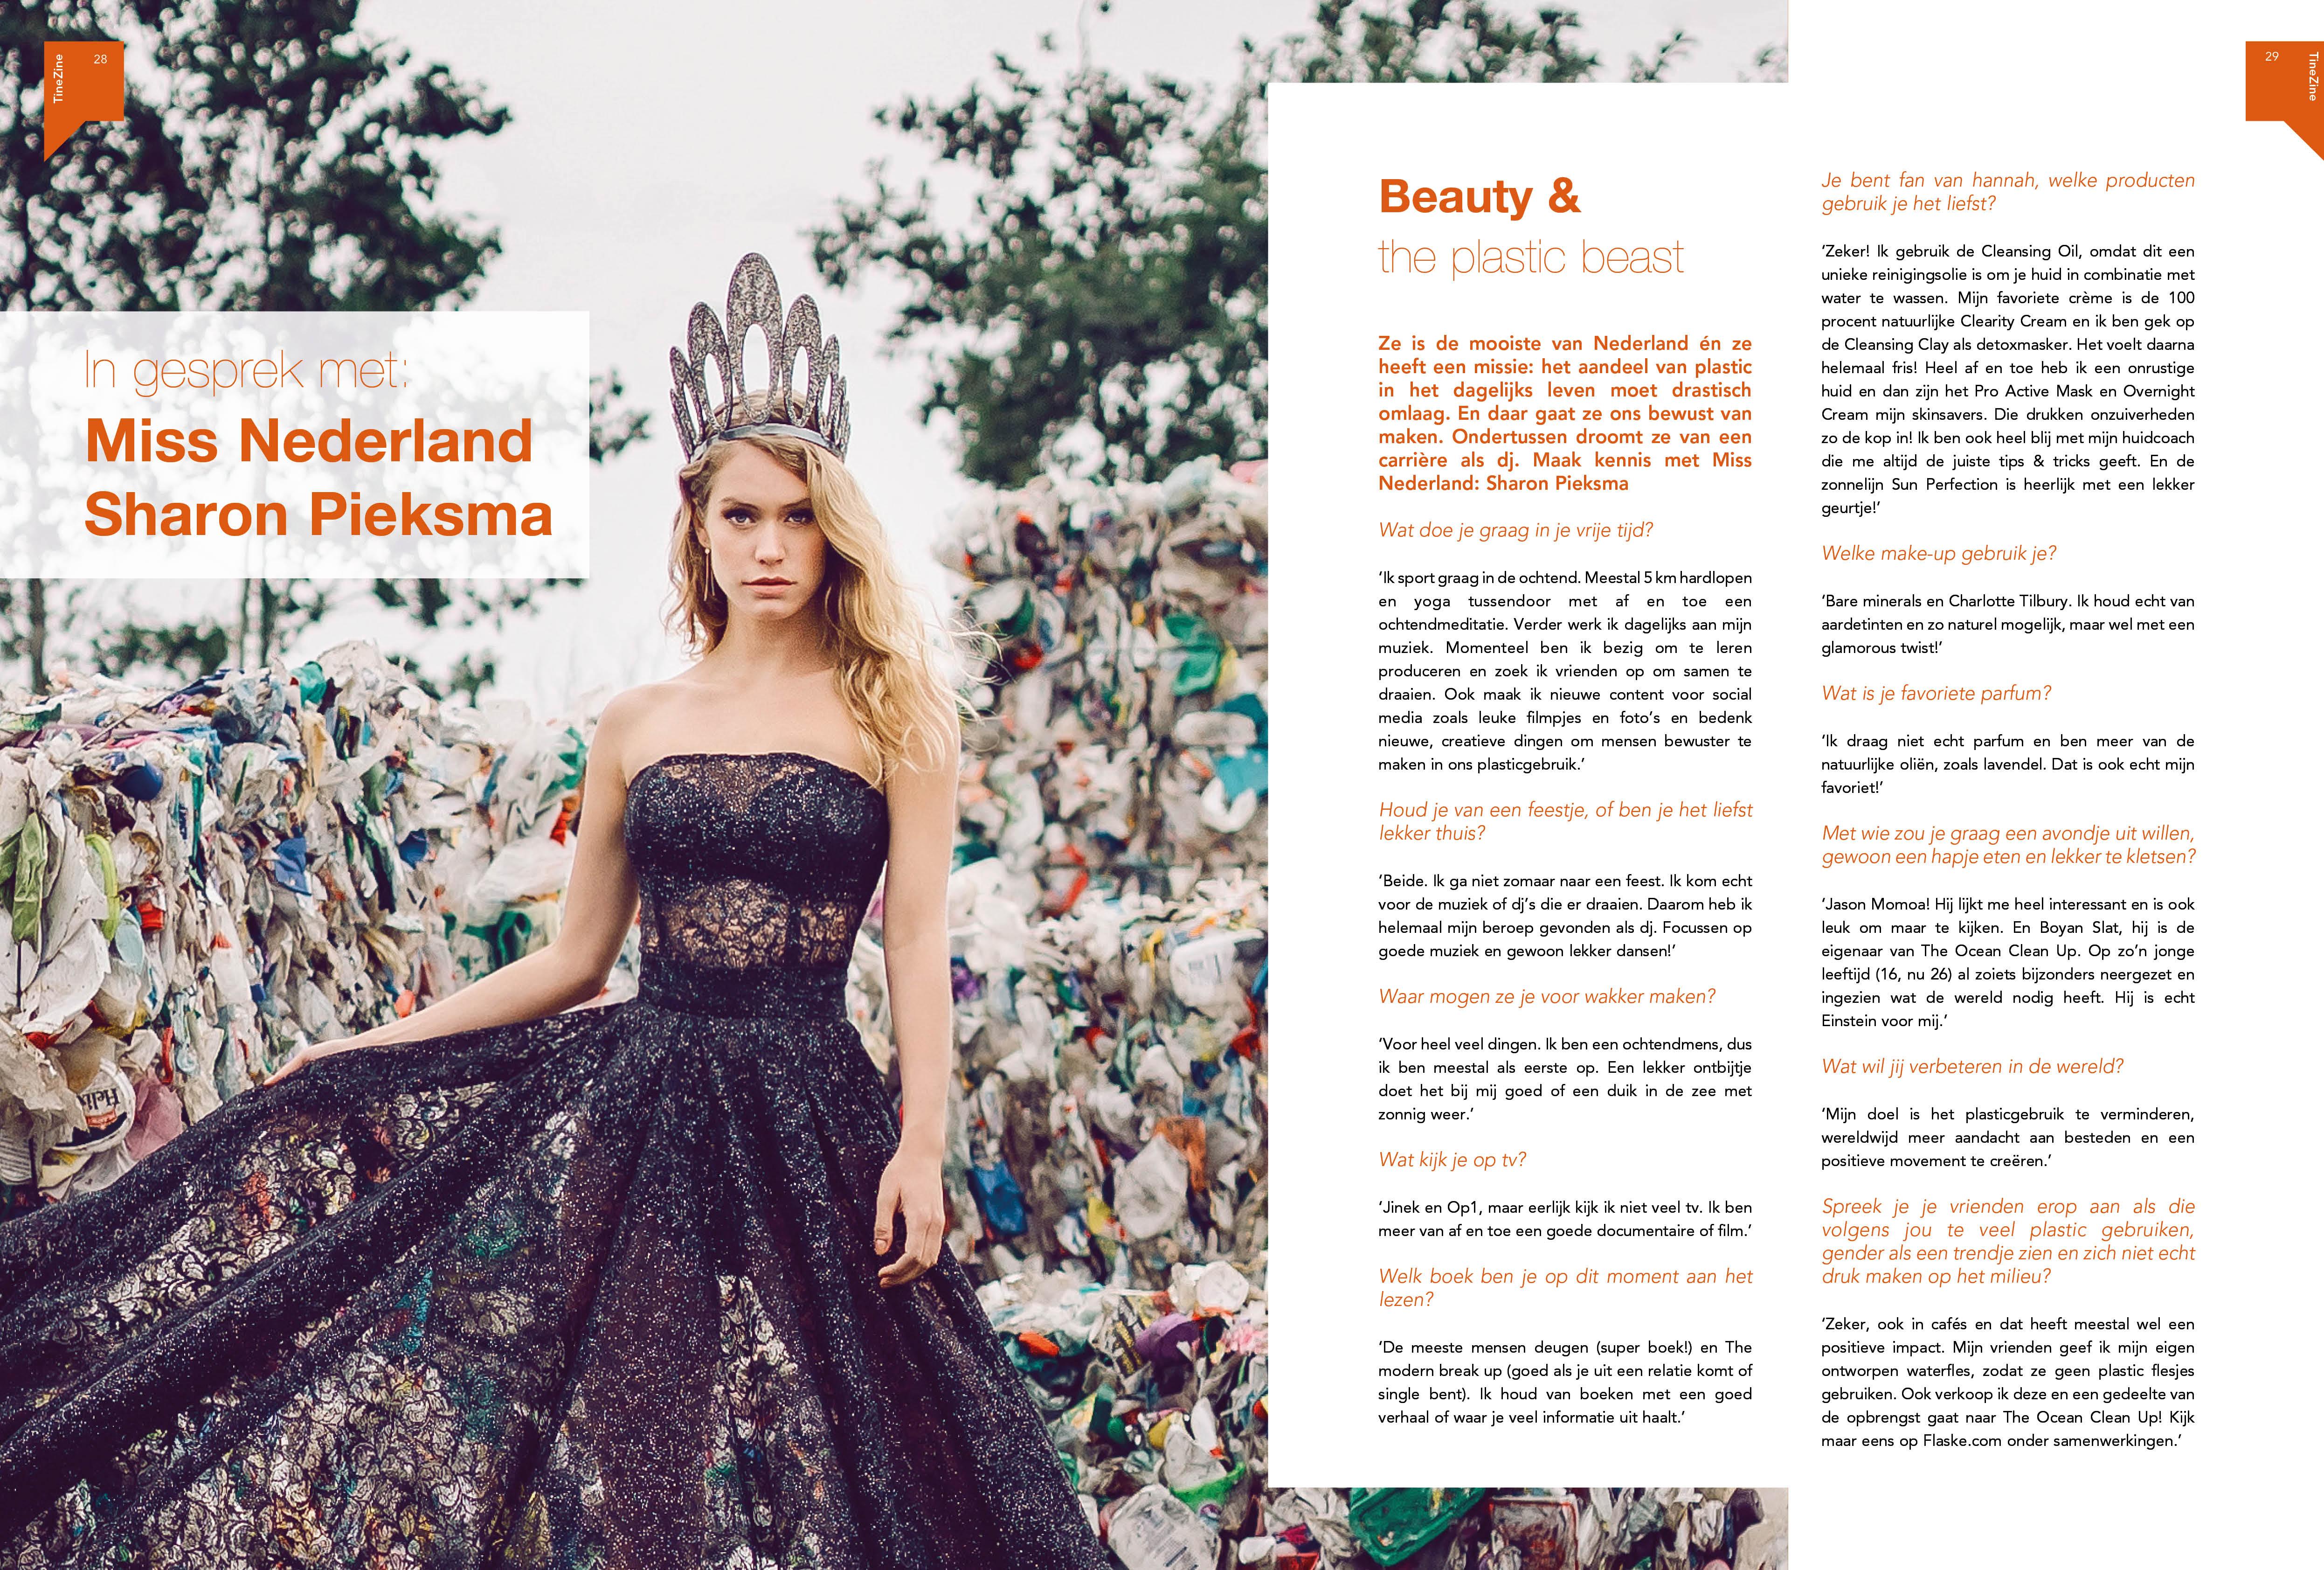 L'essence_interview Sharon Pieksma_juni